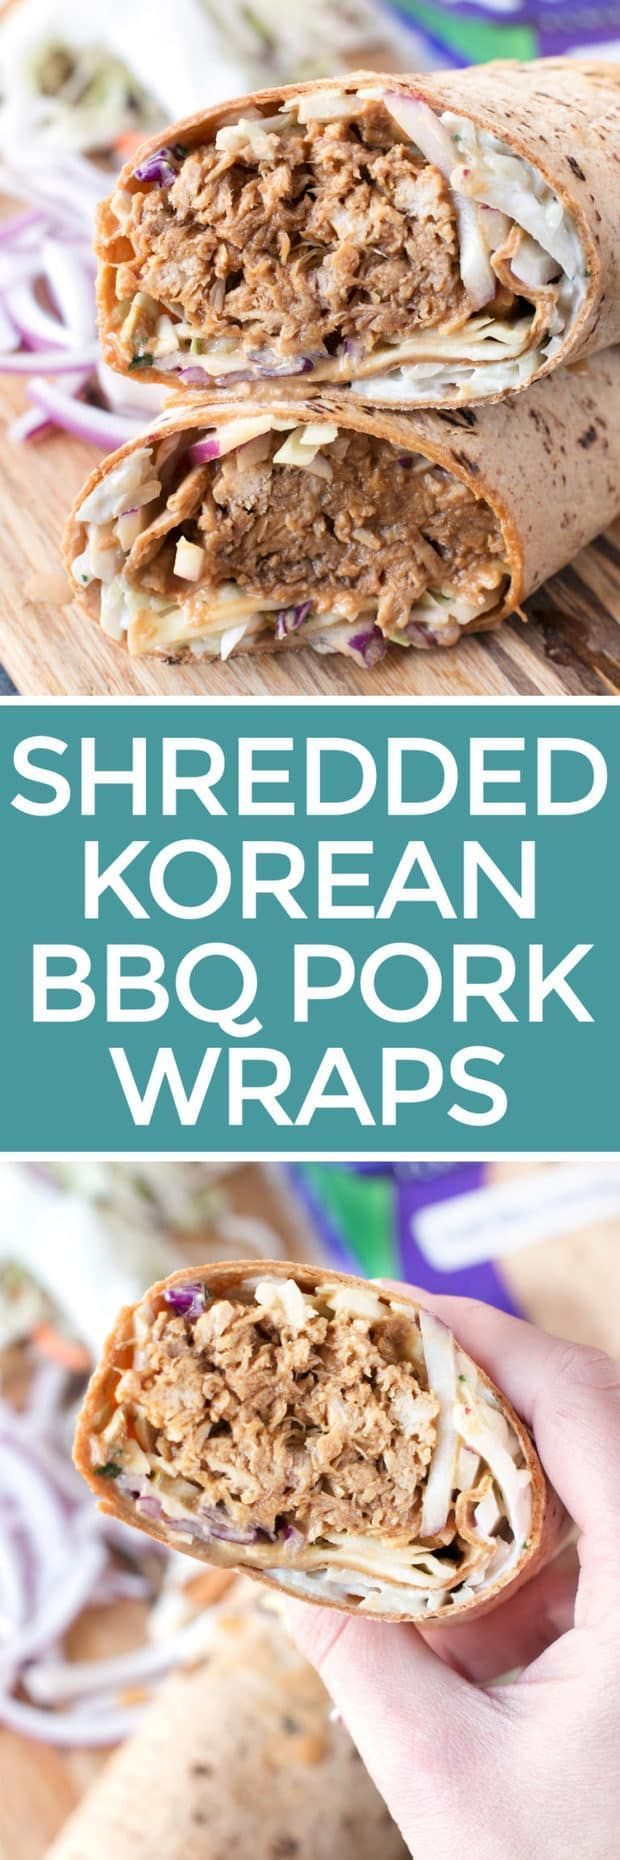 Shredded Pork Korean BBQ Wraps with Kimchi Slaw | cakenknife.com #sponsored #lunch #healthy